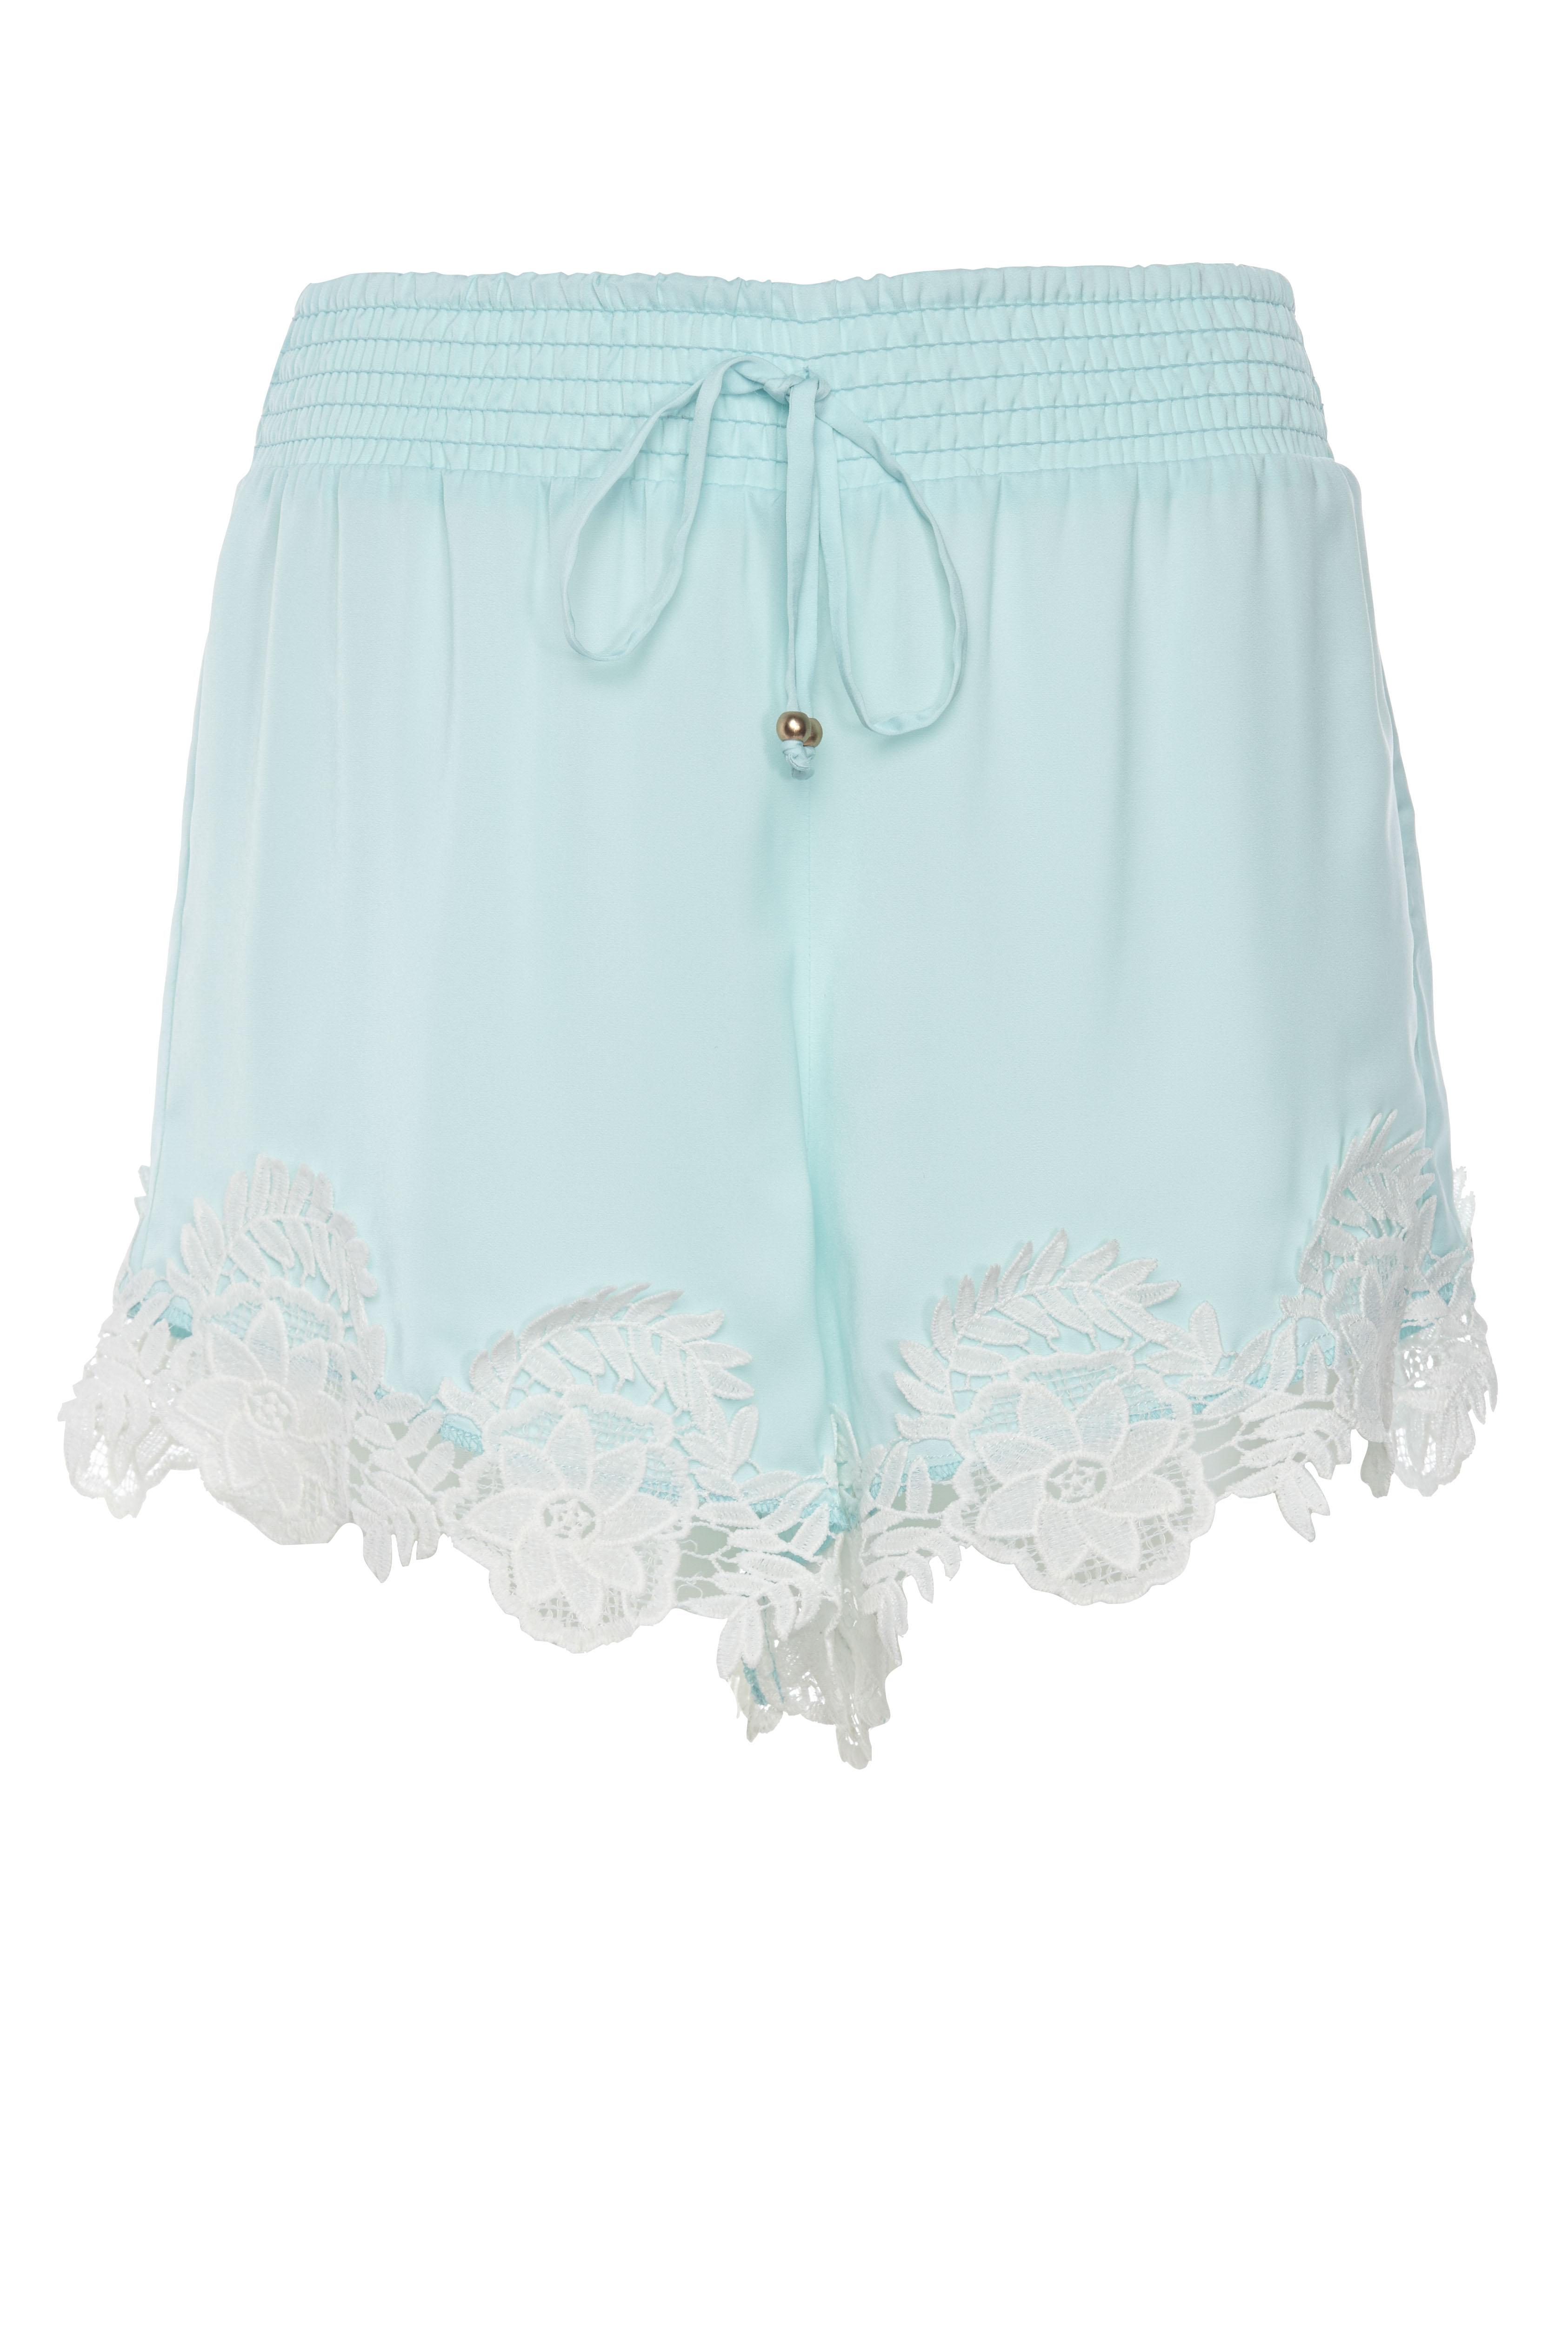 cotton-on-body_bridal-belle-short_nzd29-95_oct-nov-dec